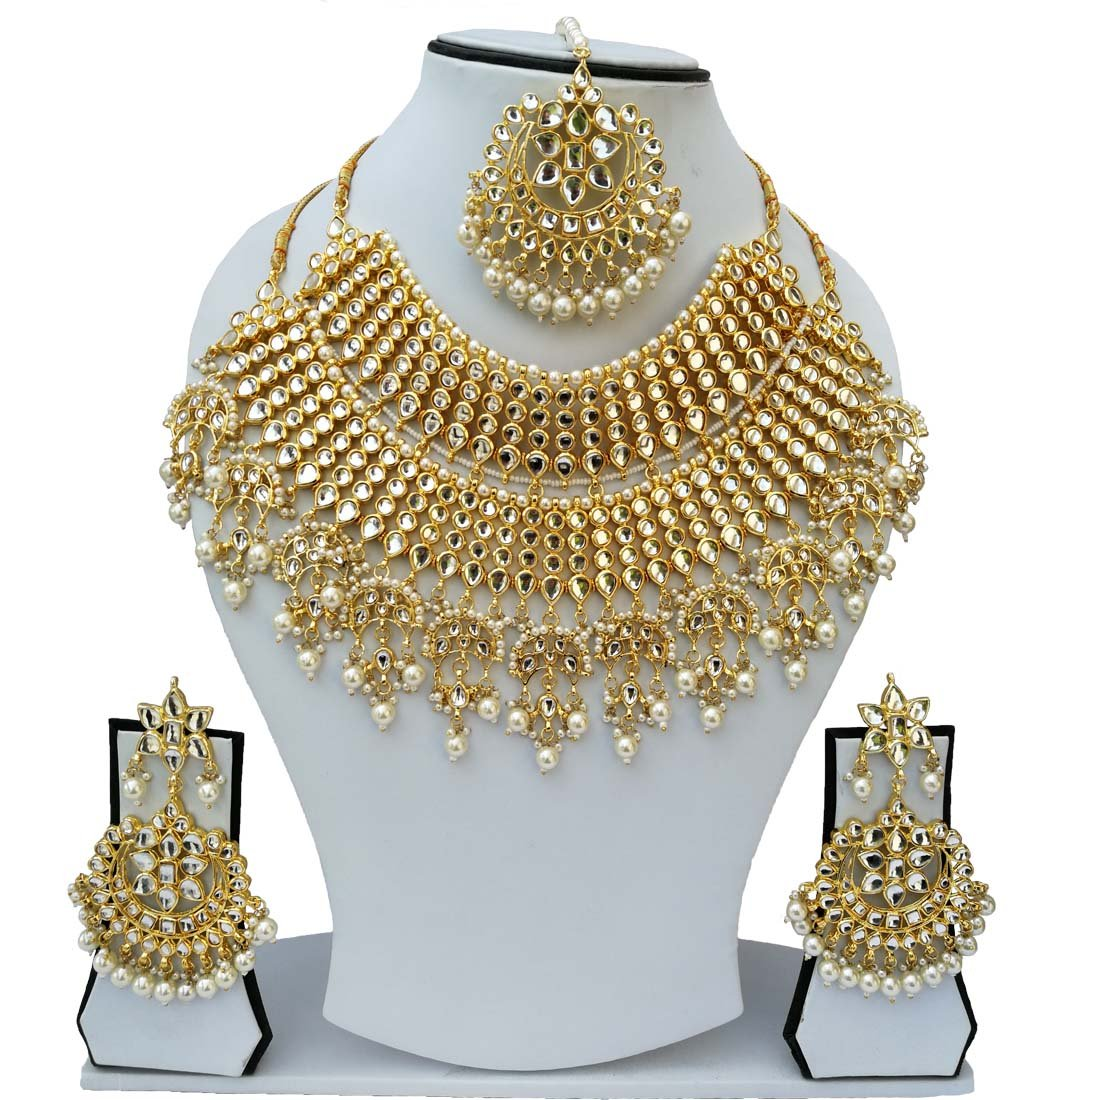 Fkraft Kundan Gold Plated Latest Wedding Necklace Jewelry Set for Women Self Handmade FMK-WHT025